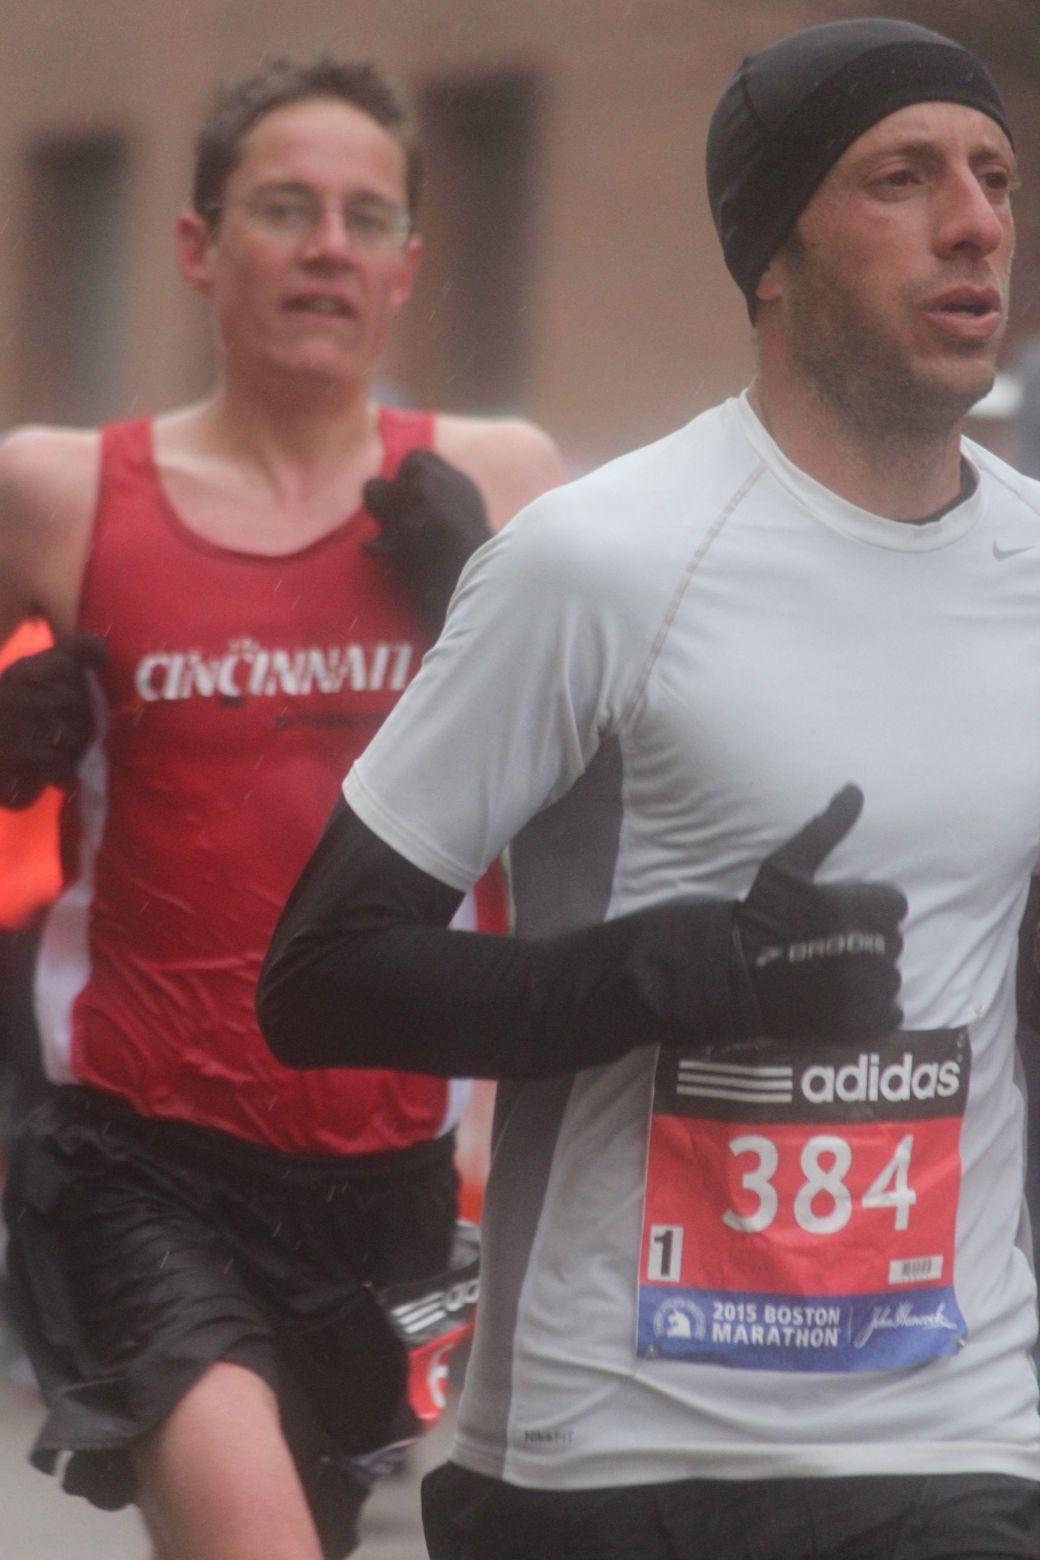 boston marathon april 20 2015 racer number 384